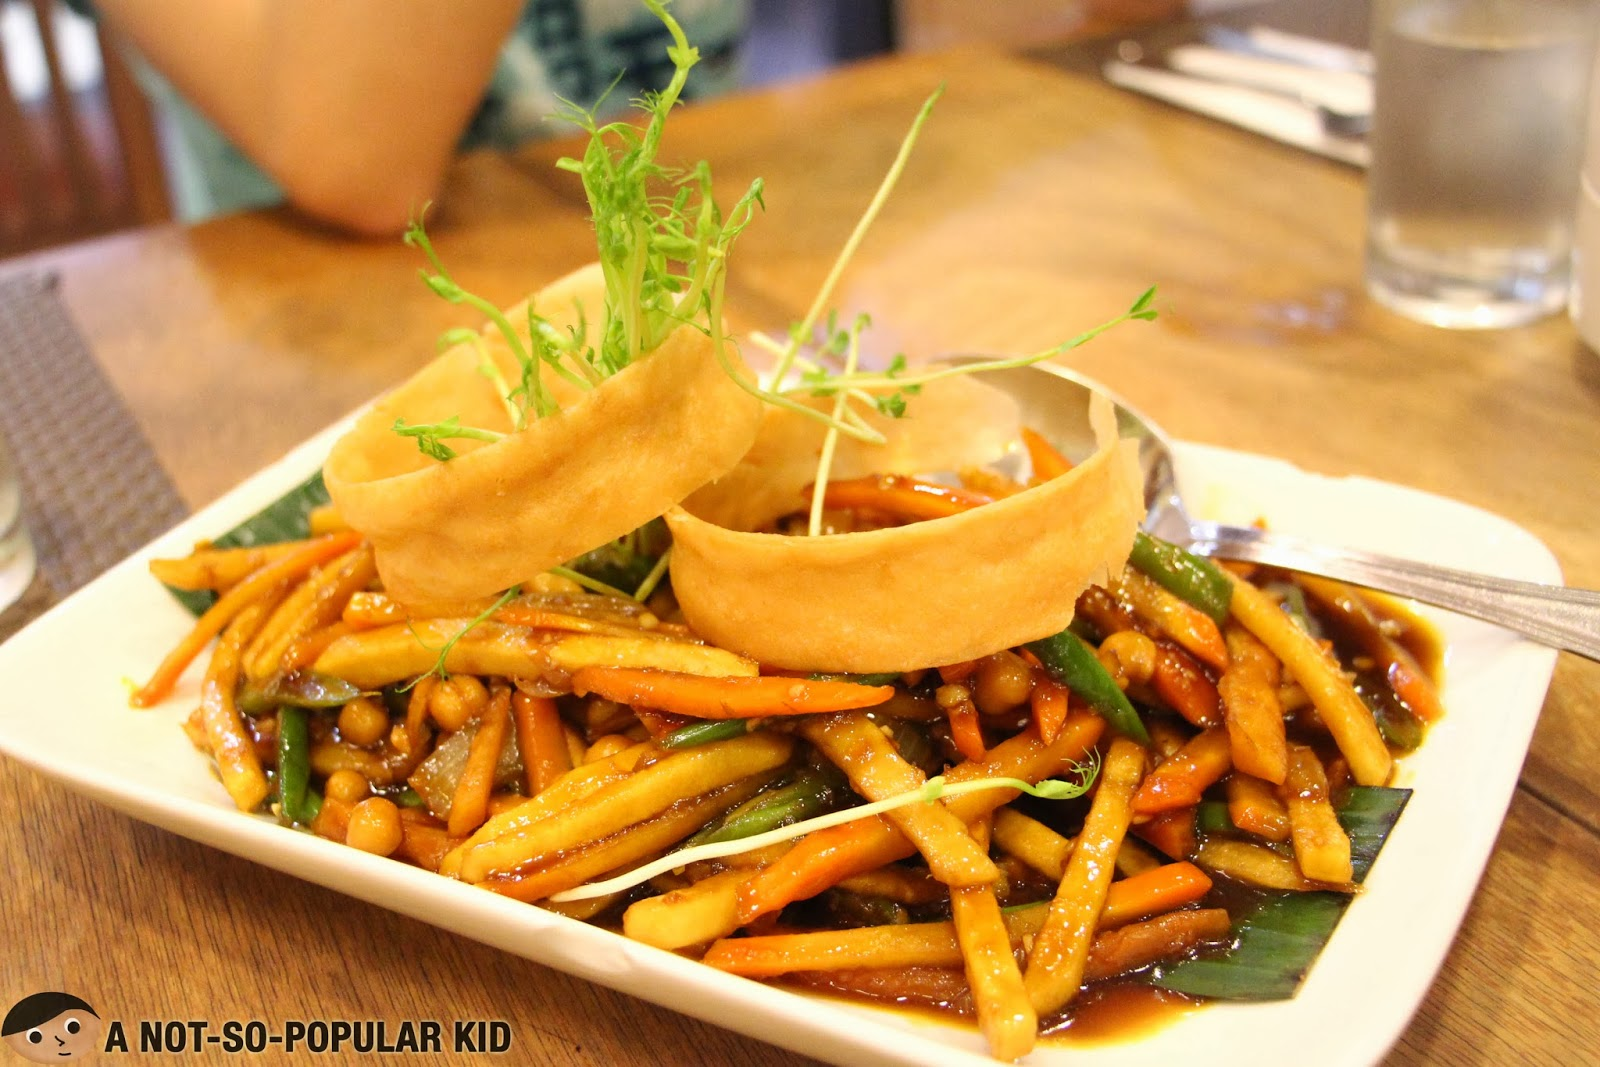 C2 Classic Cuisine's Lumpiang Hubad